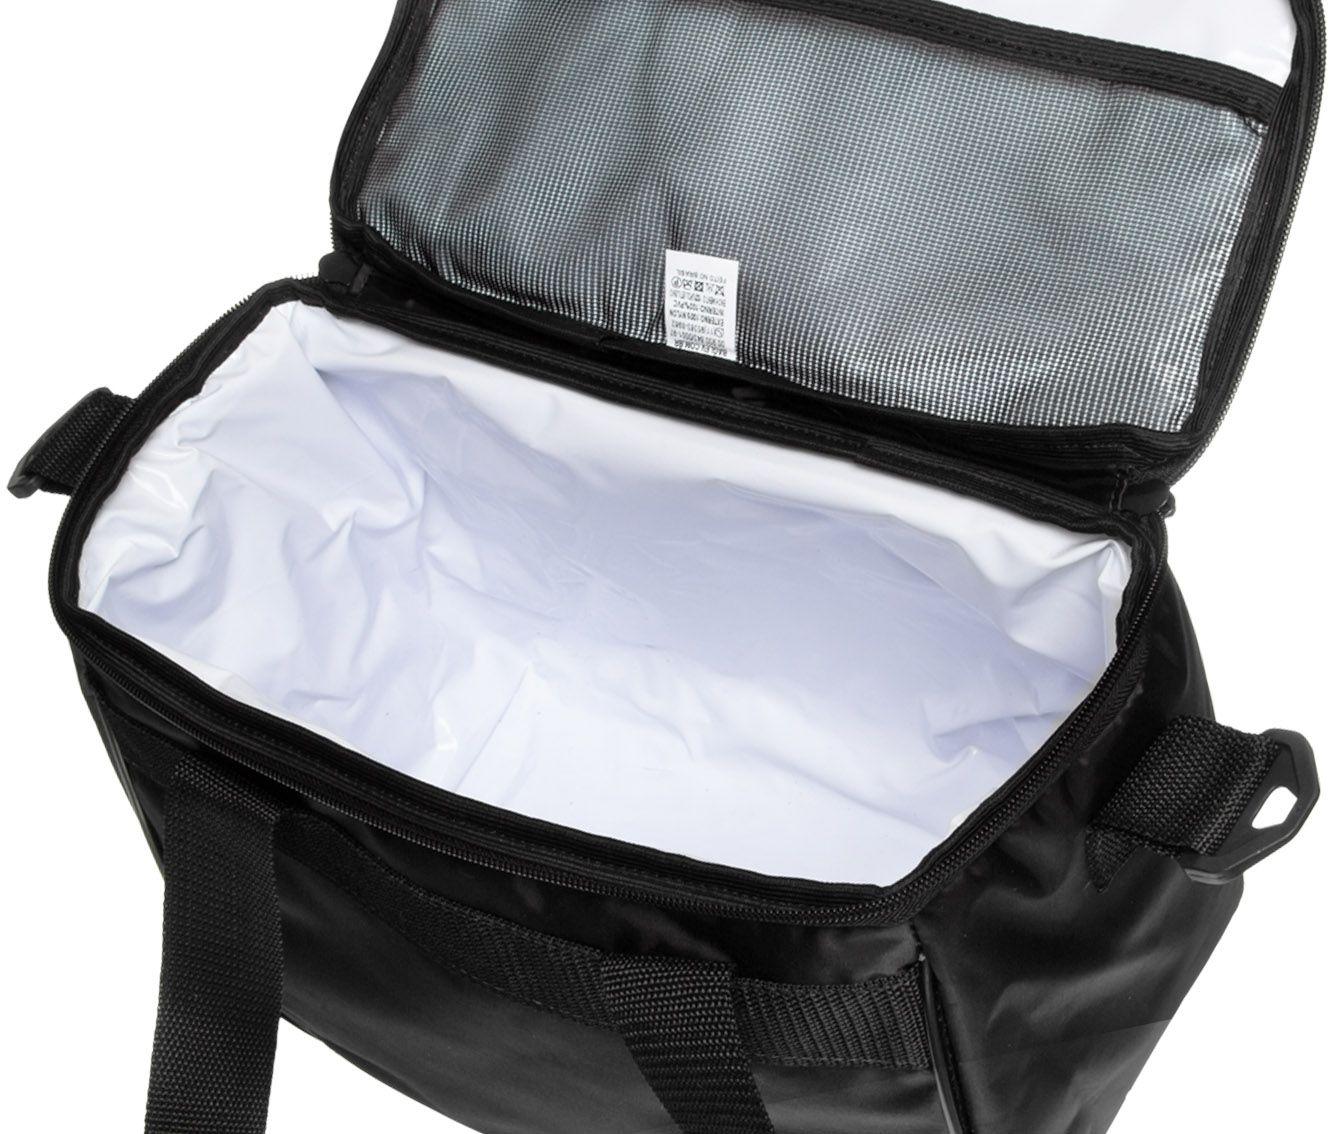 Bolsa Térmica Box Nylon - Frio